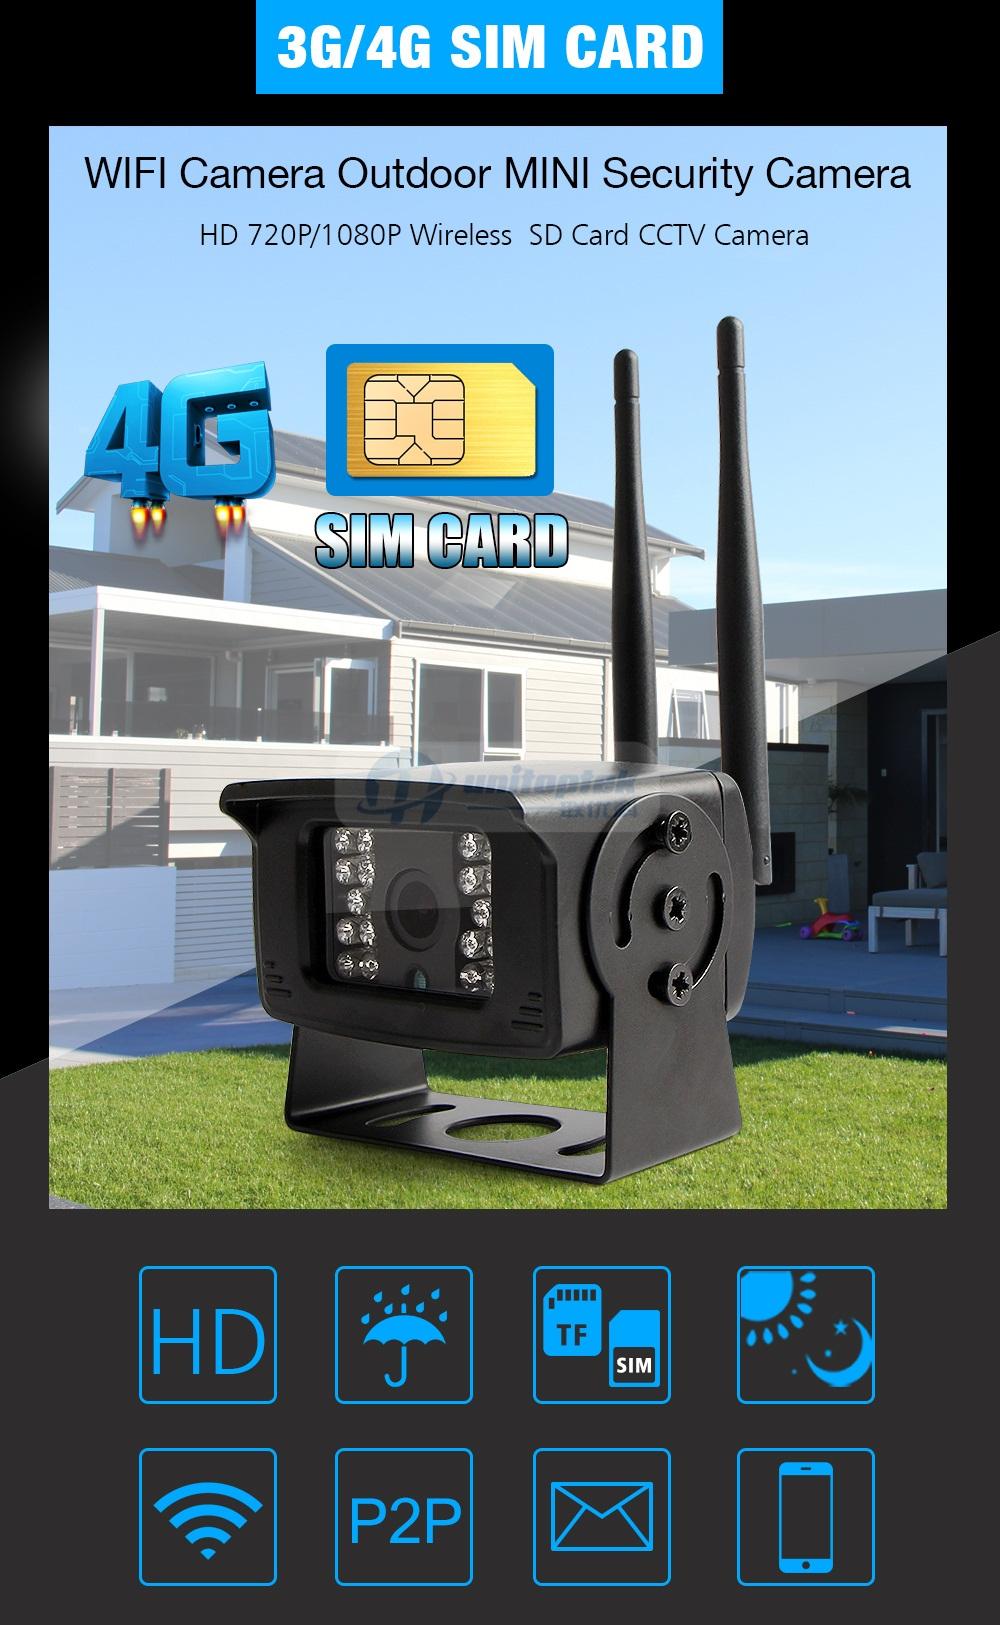 01 4g wifi camera